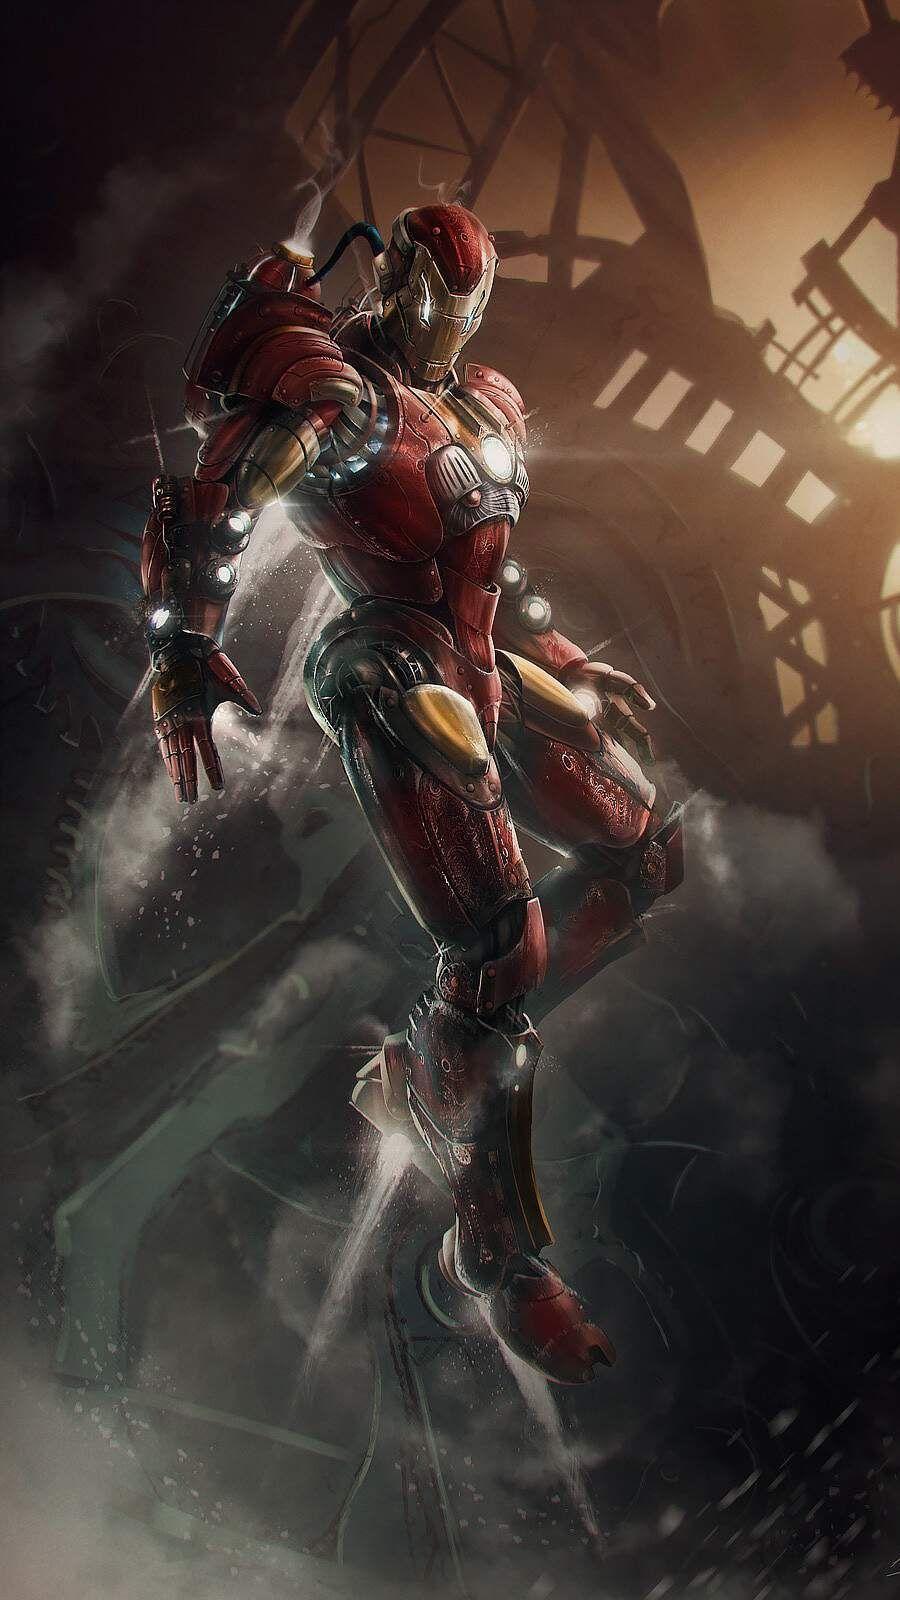 Iron Man Steampunk Iphone Wallpaper Em 2020 Herois Marvel Marvel Herois